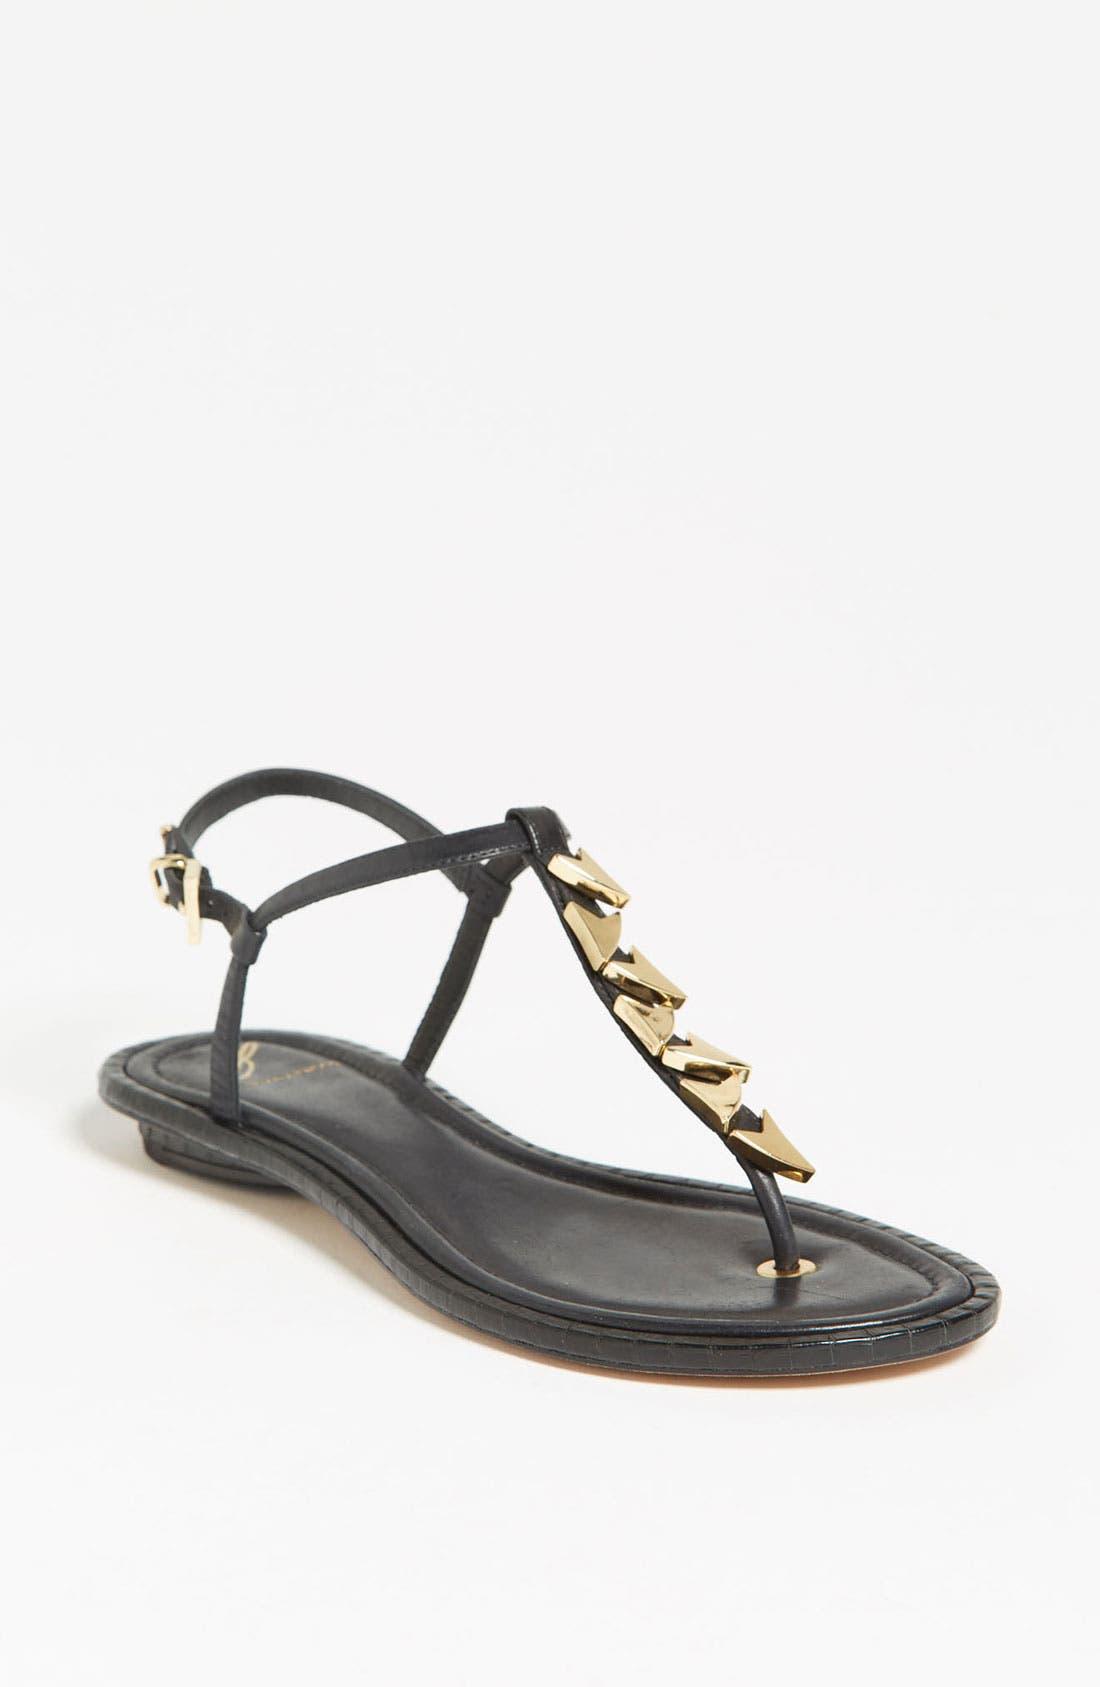 Main Image - B Brian Atwood 'Crickett' Sandal